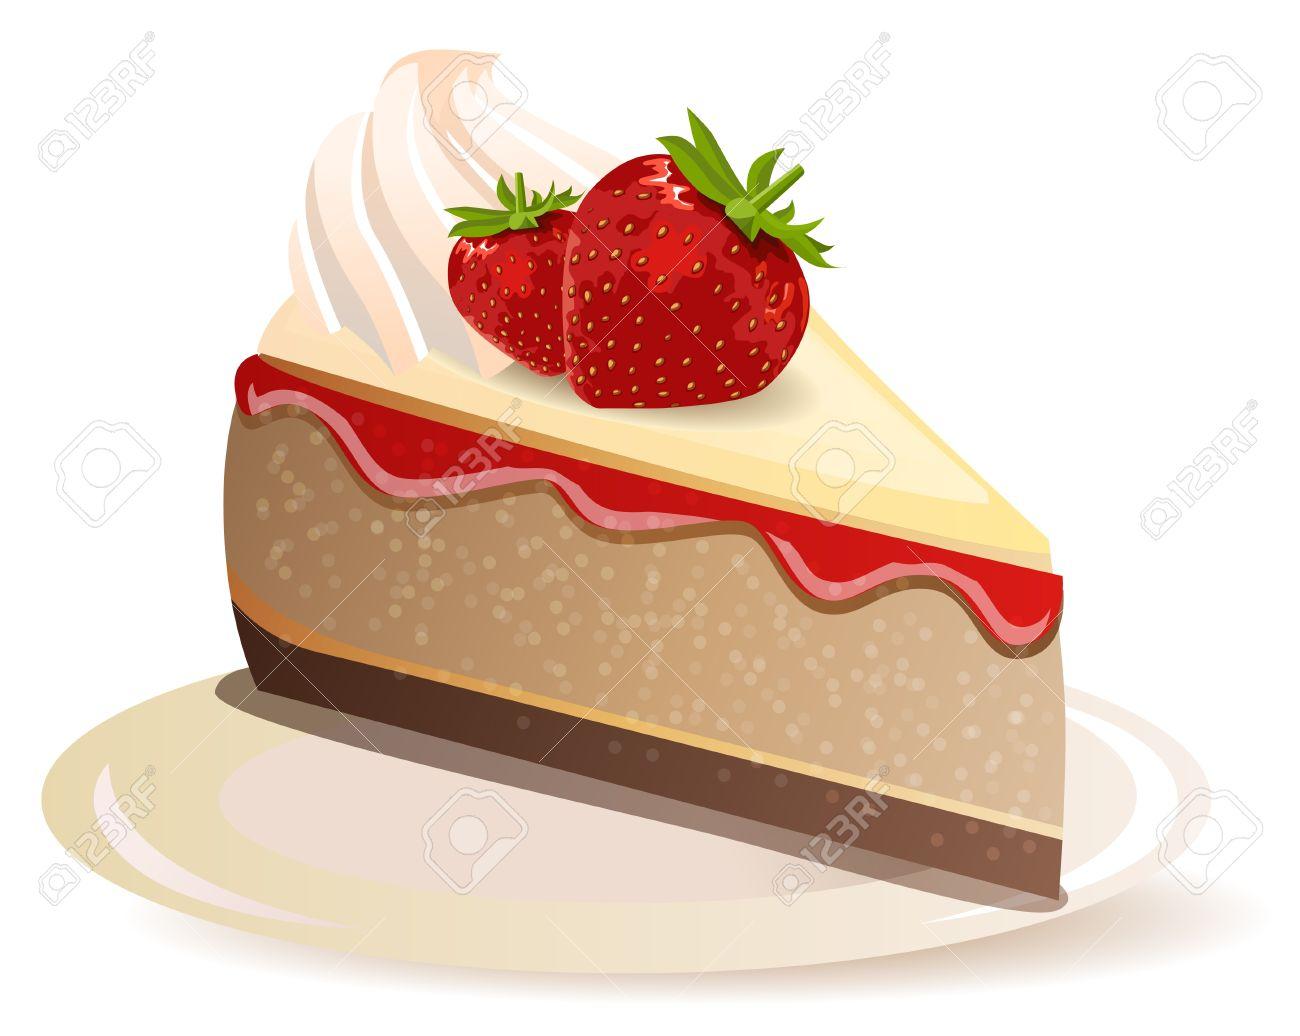 Cute slice of cake clipart graphic transparent stock Cute strawberry cake clipart - ClipartFox graphic transparent stock